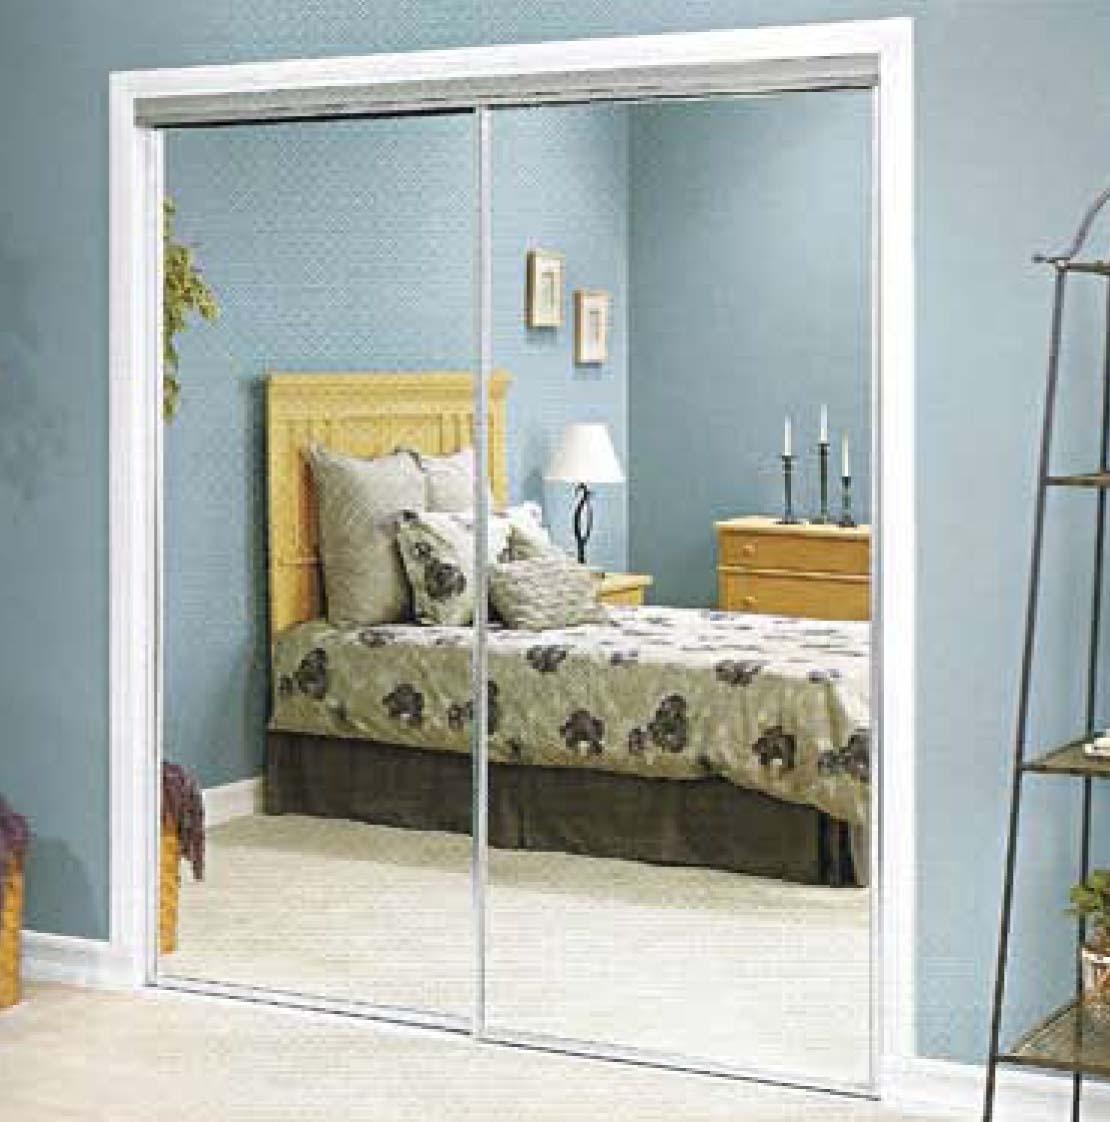 Sliding Closet Doors Half Mirrorenchanting closet doors sliding mirror 111 sliding closet doors